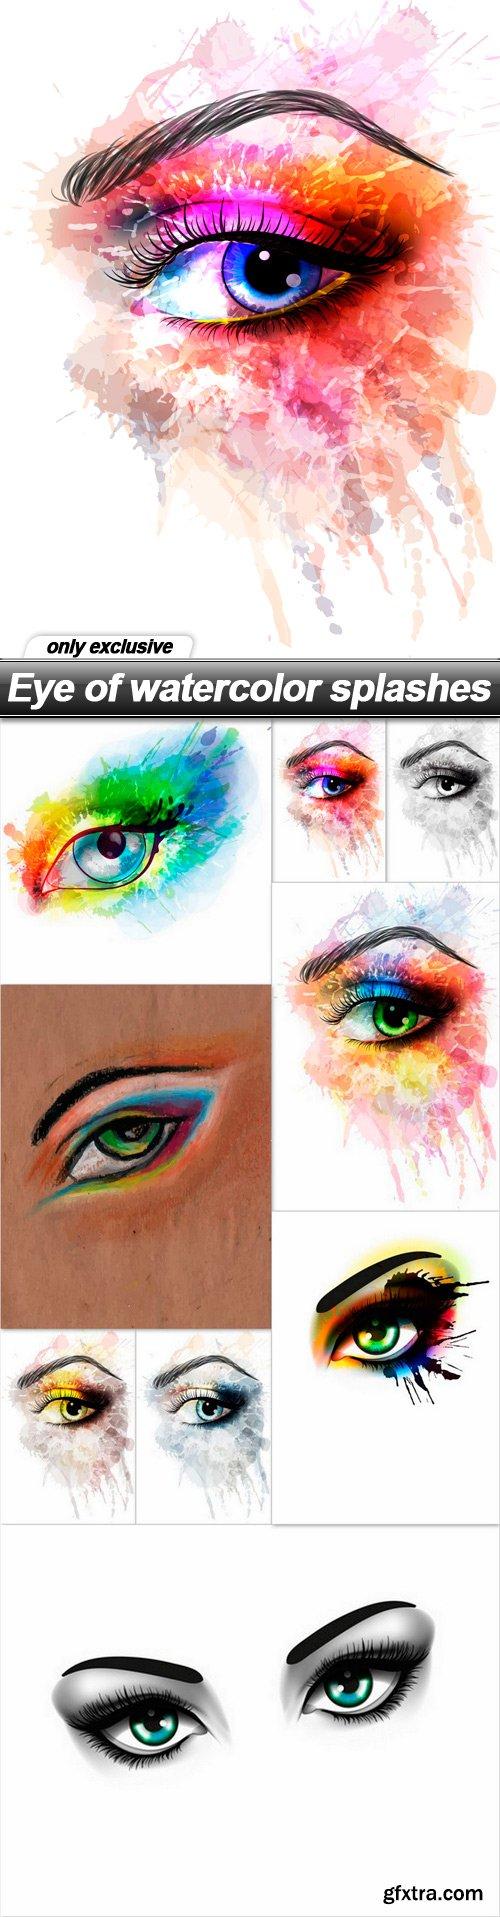 Eye of watercolor splashes - 9 EPS